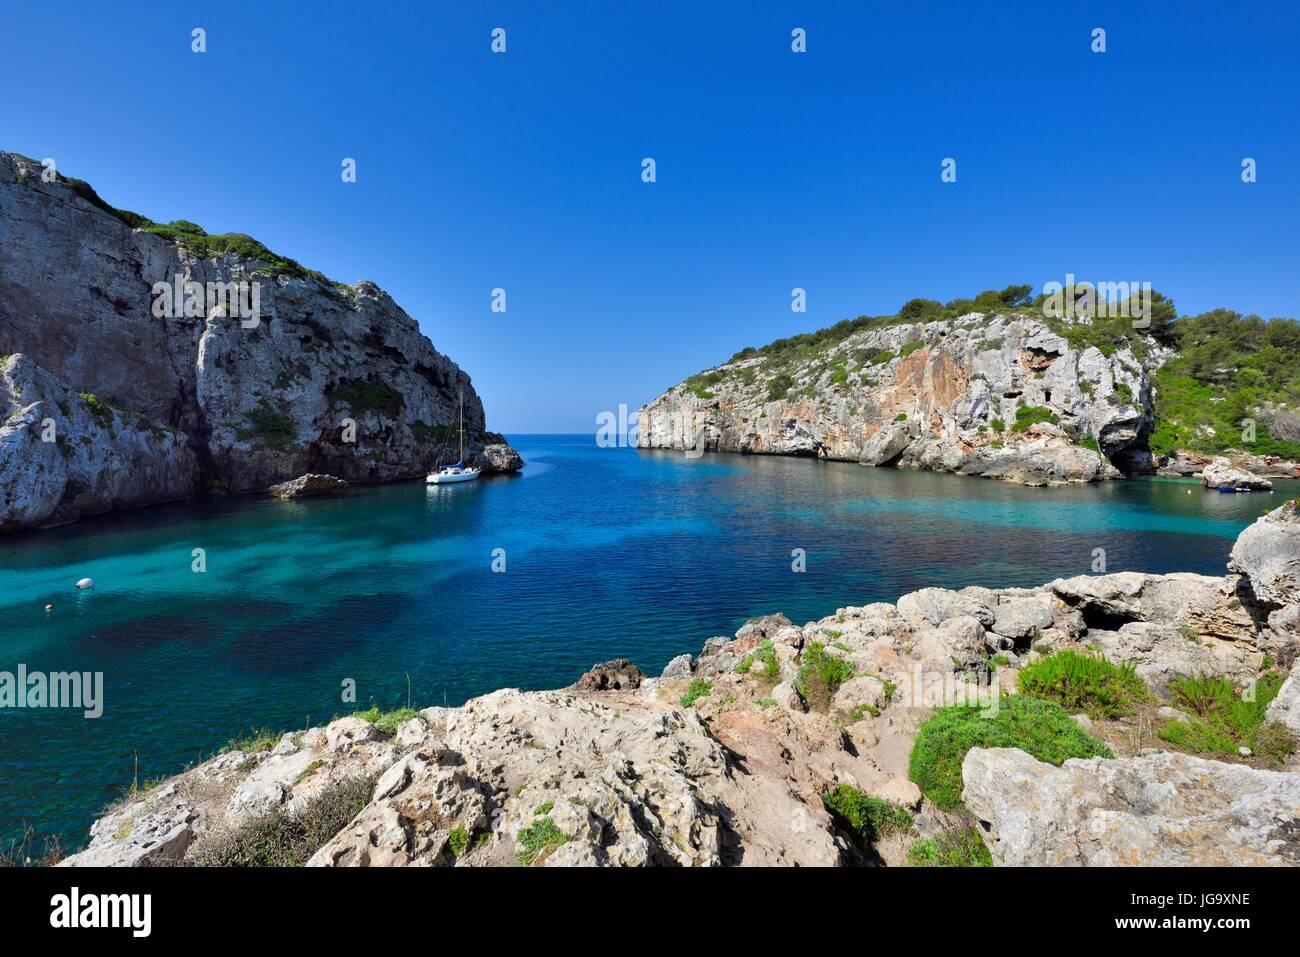 Cales Coves Menorca Spain - Stock Image